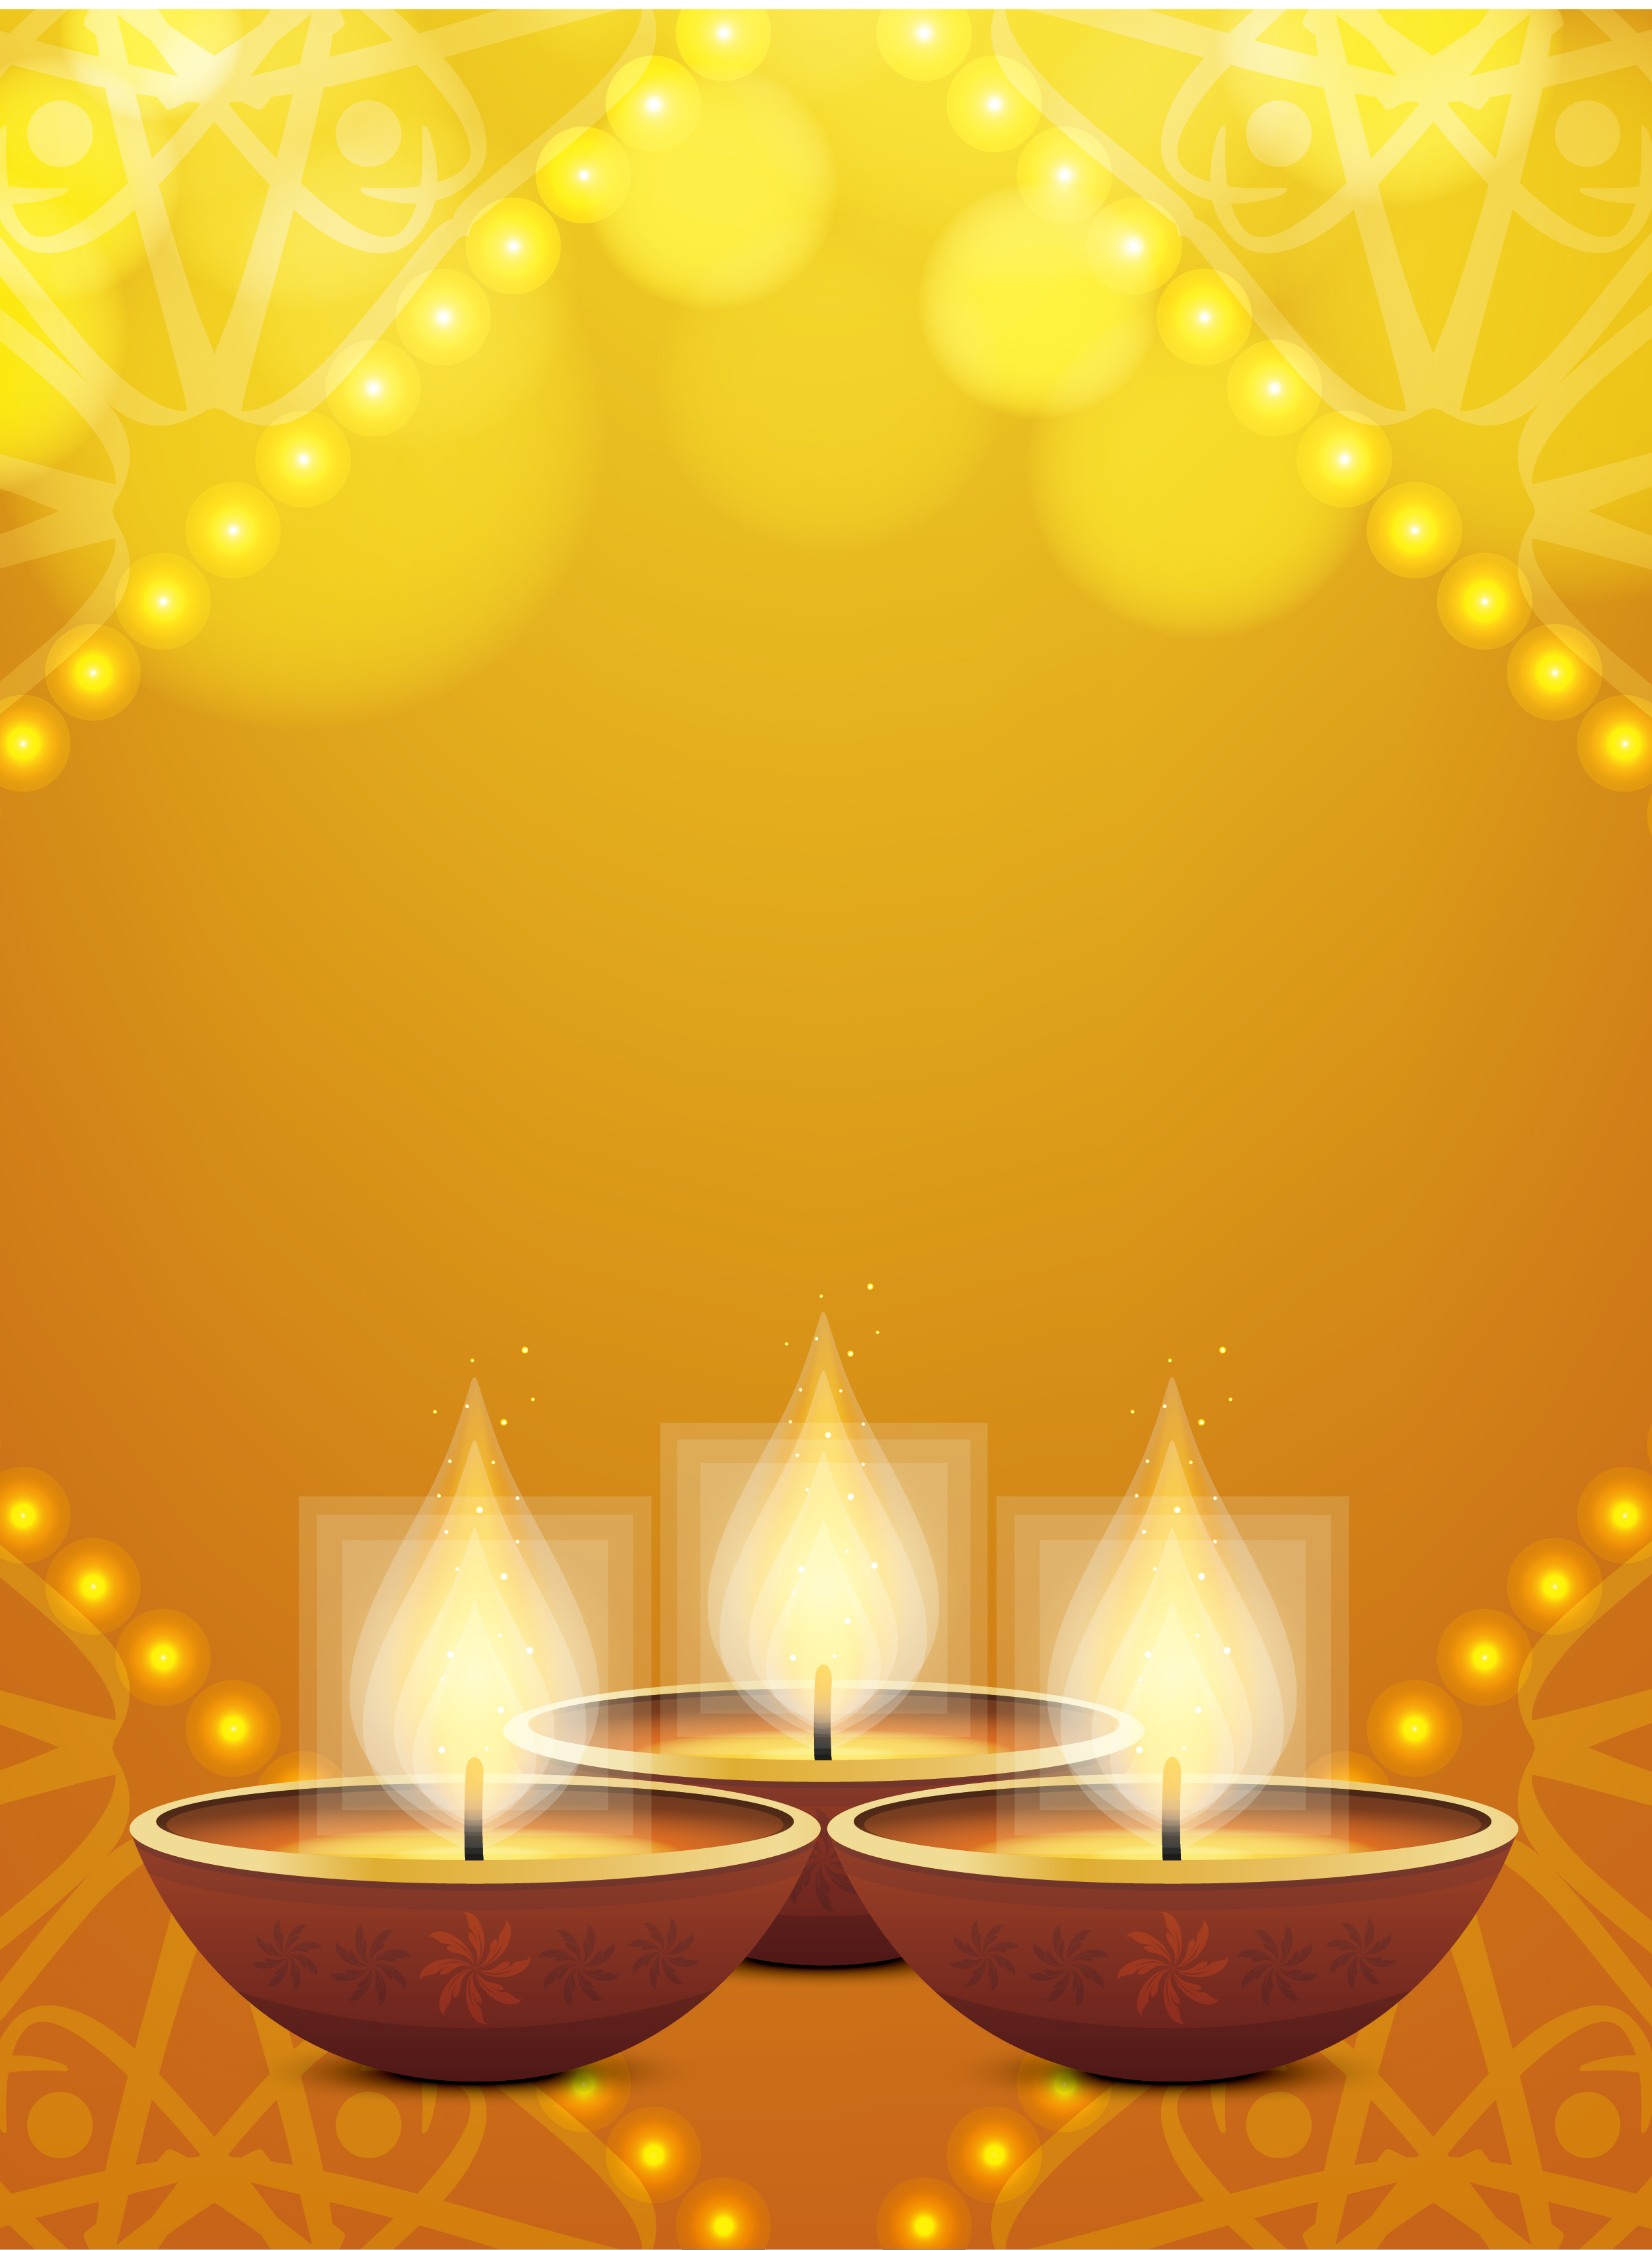 diwali confetti background  diwali  diwali lights  happy diwali background image for free download